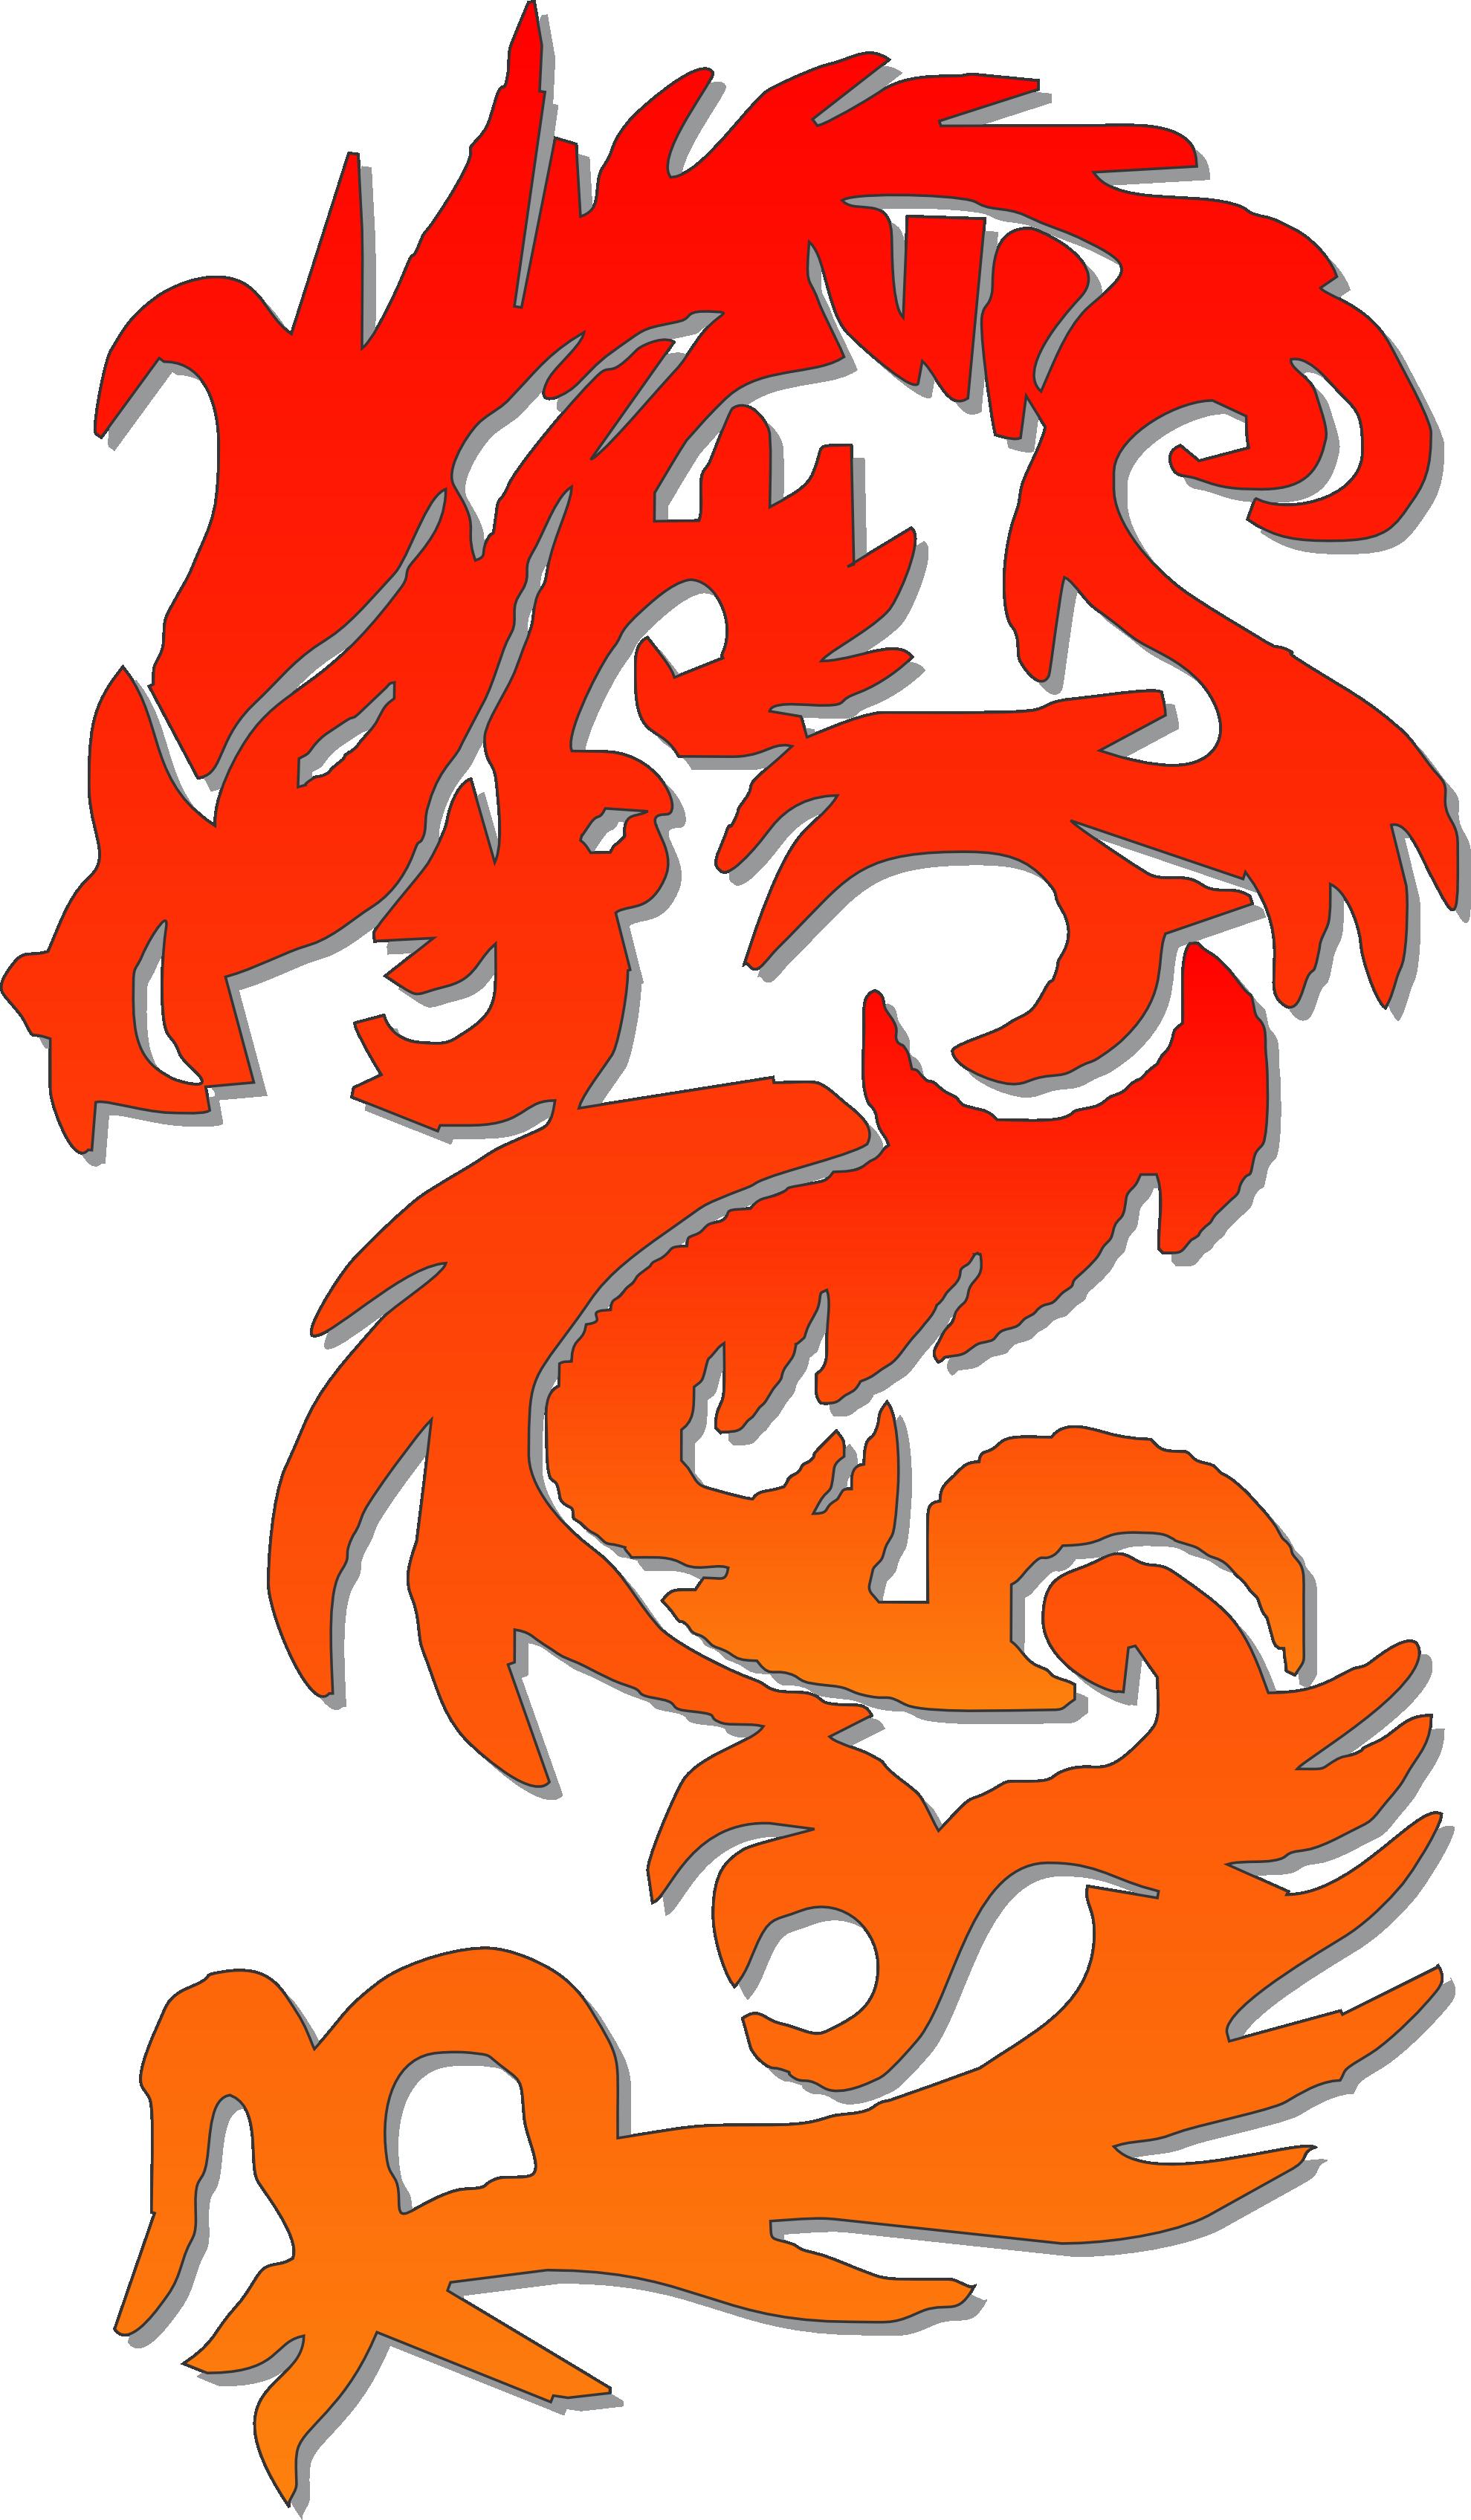 chinese new year dragon clip art - photo #5